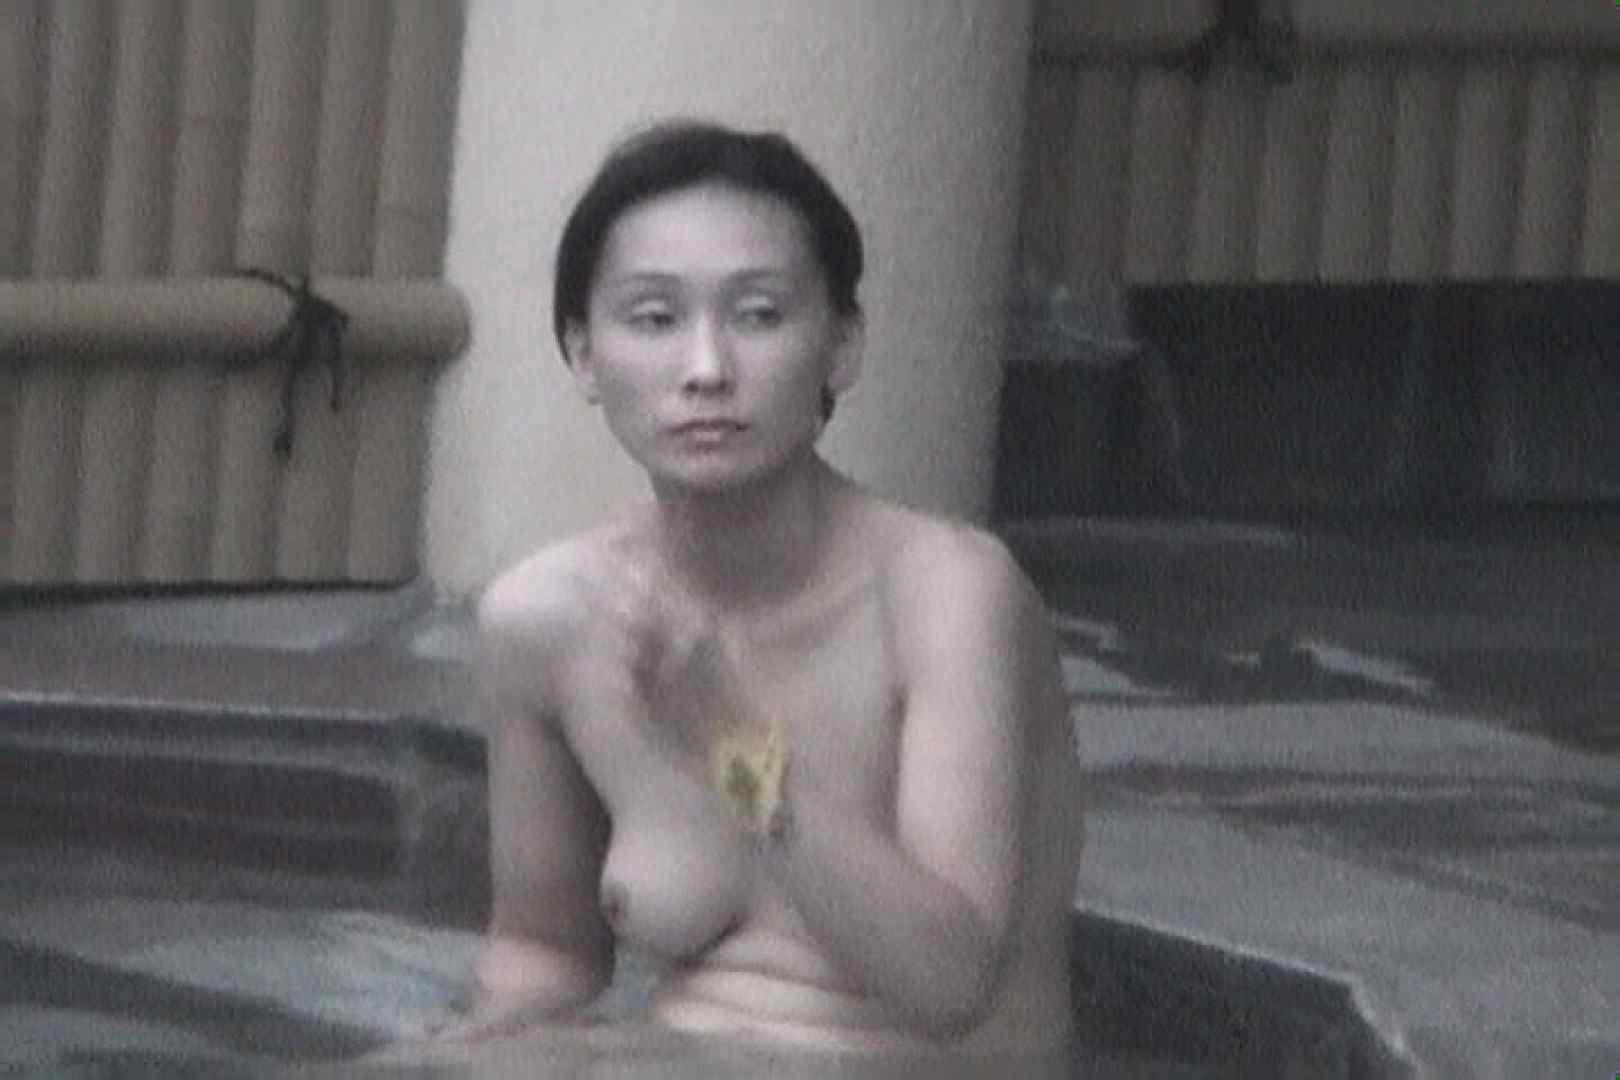 Aquaな露天風呂Vol.557 露天風呂編 | 盗撮シリーズ  100PIX 13